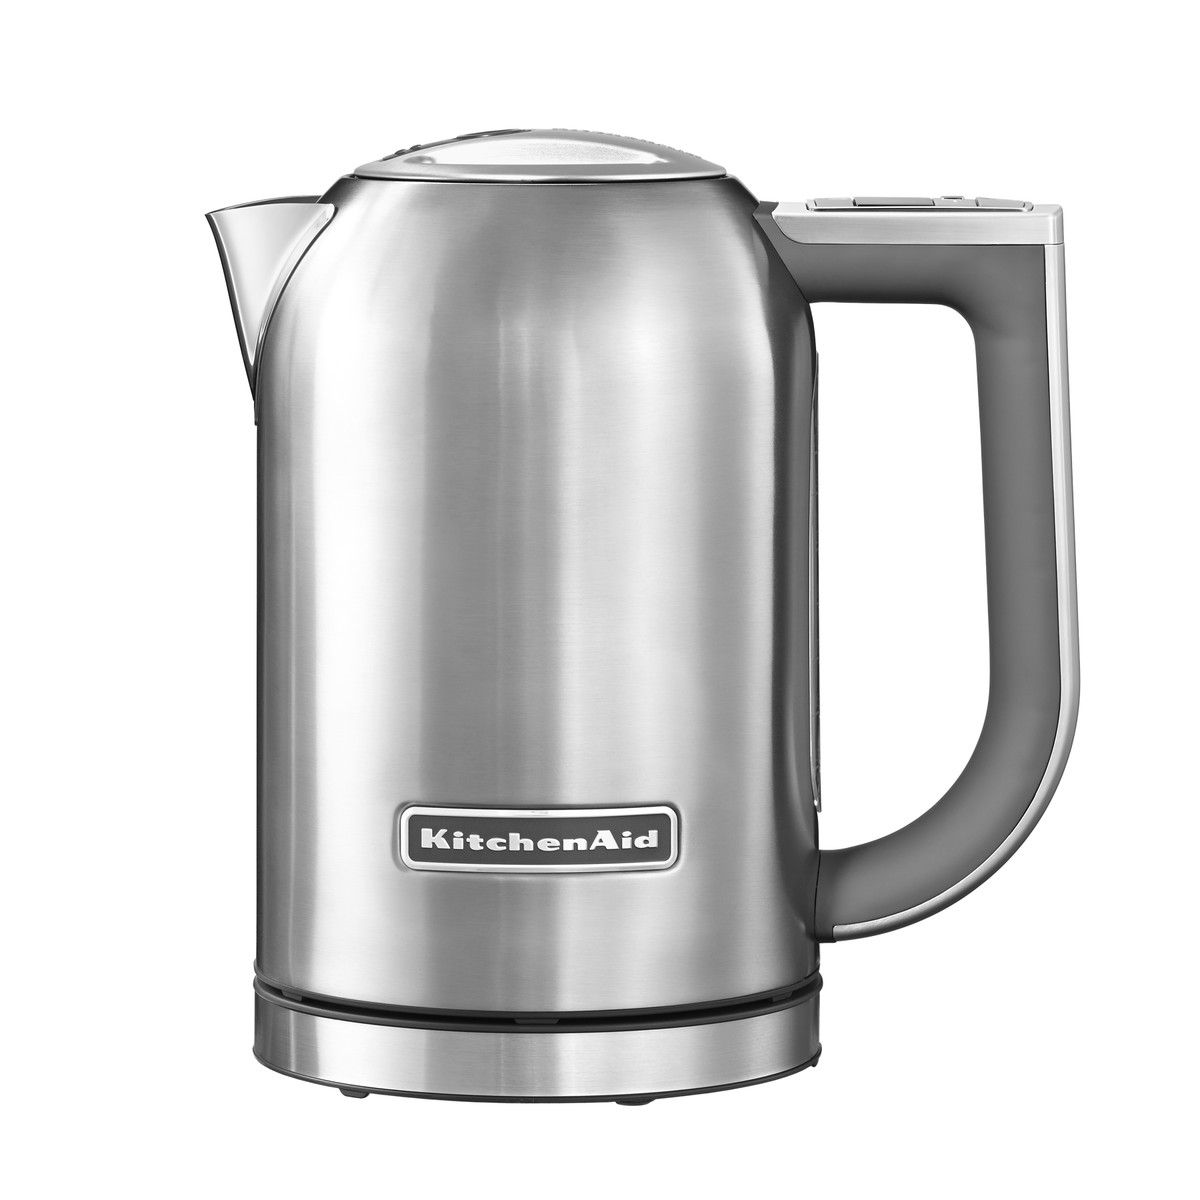 Wasserkocher Modern kitchenaid wasserkocher 1 7 l 5kek1722 empire rot kettle